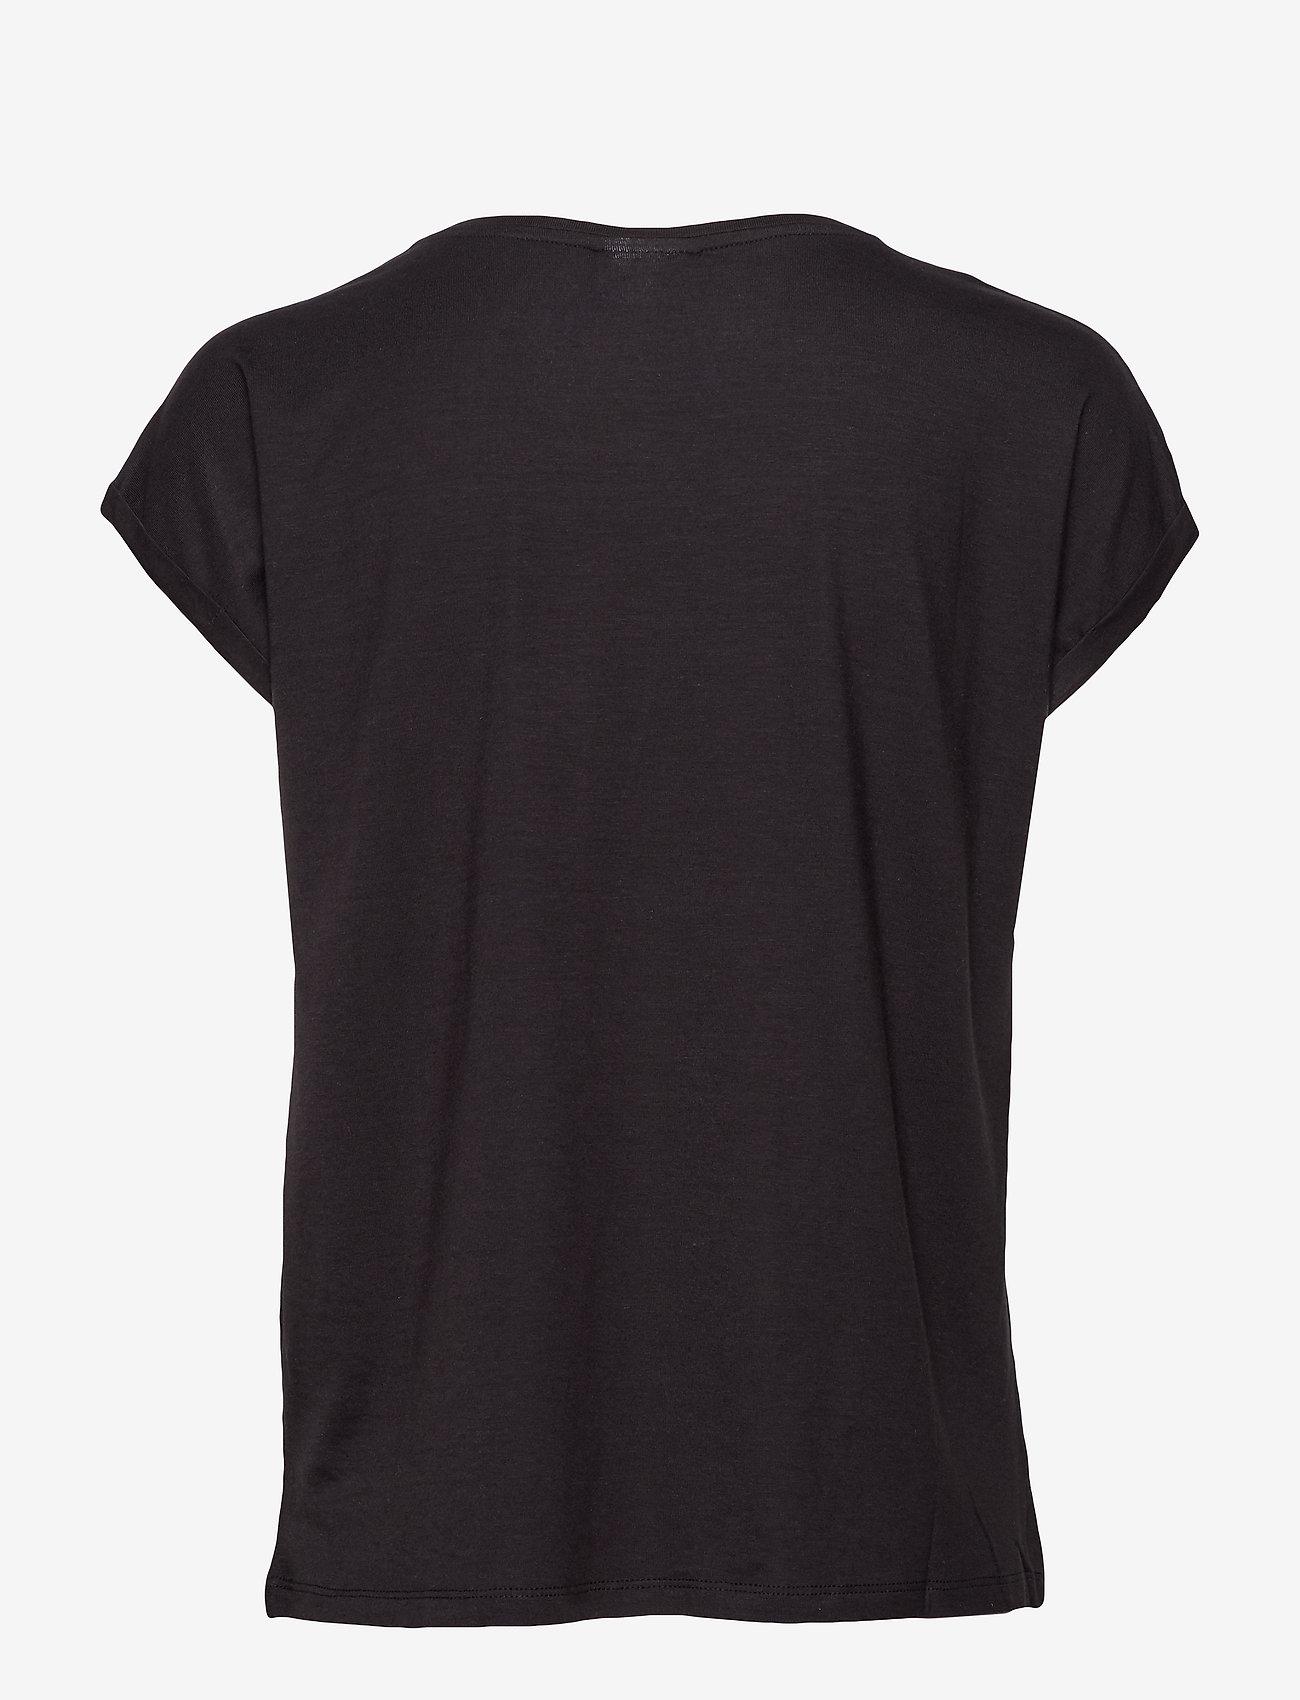 Vero Moda - VMAVA PLAIN SS TOP GA - t-shirts - black - 1